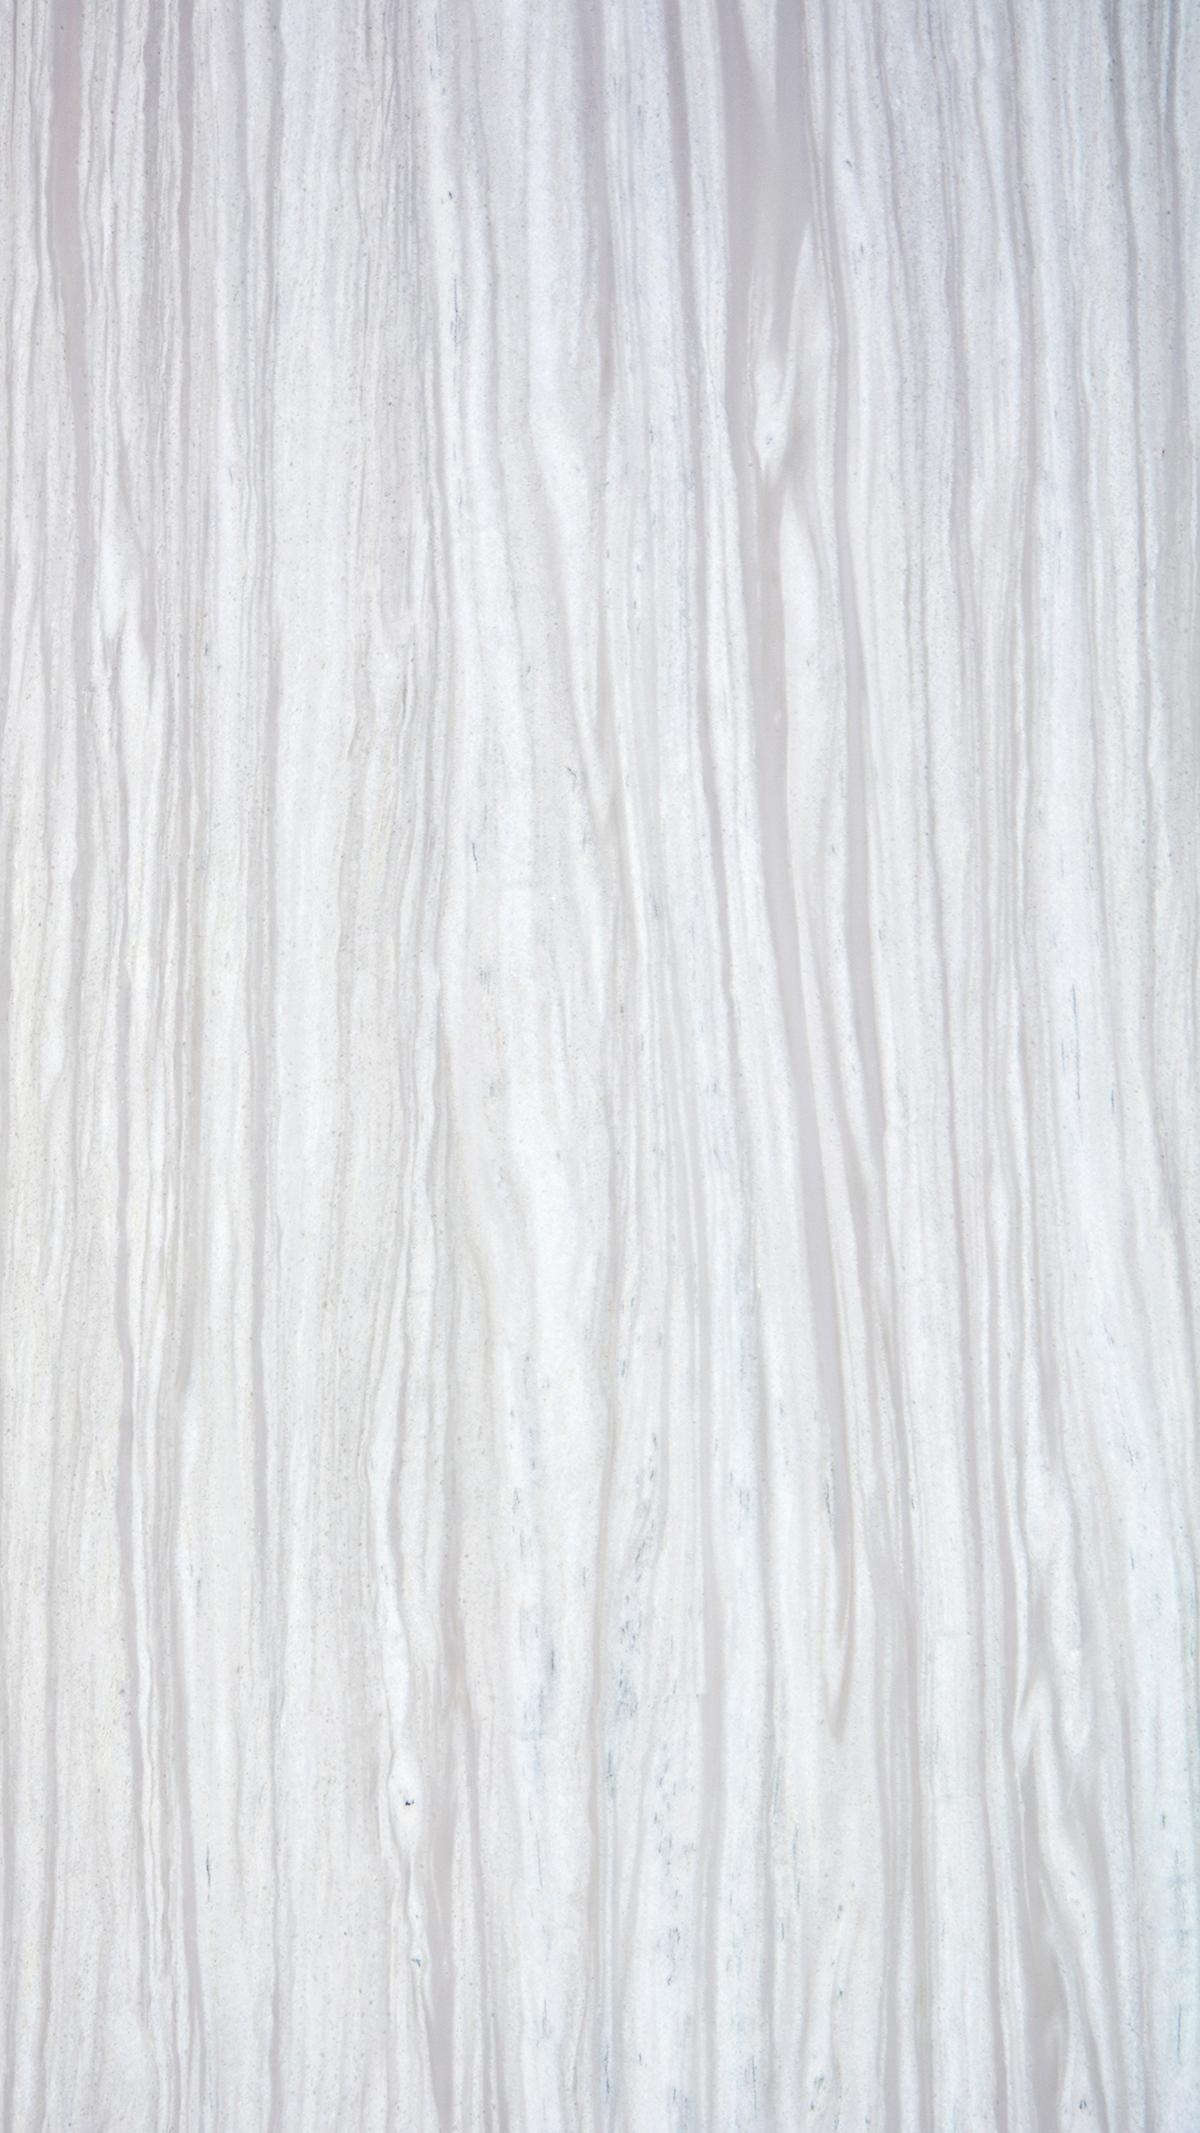 SIBERIAN WHITE VC MARBLE